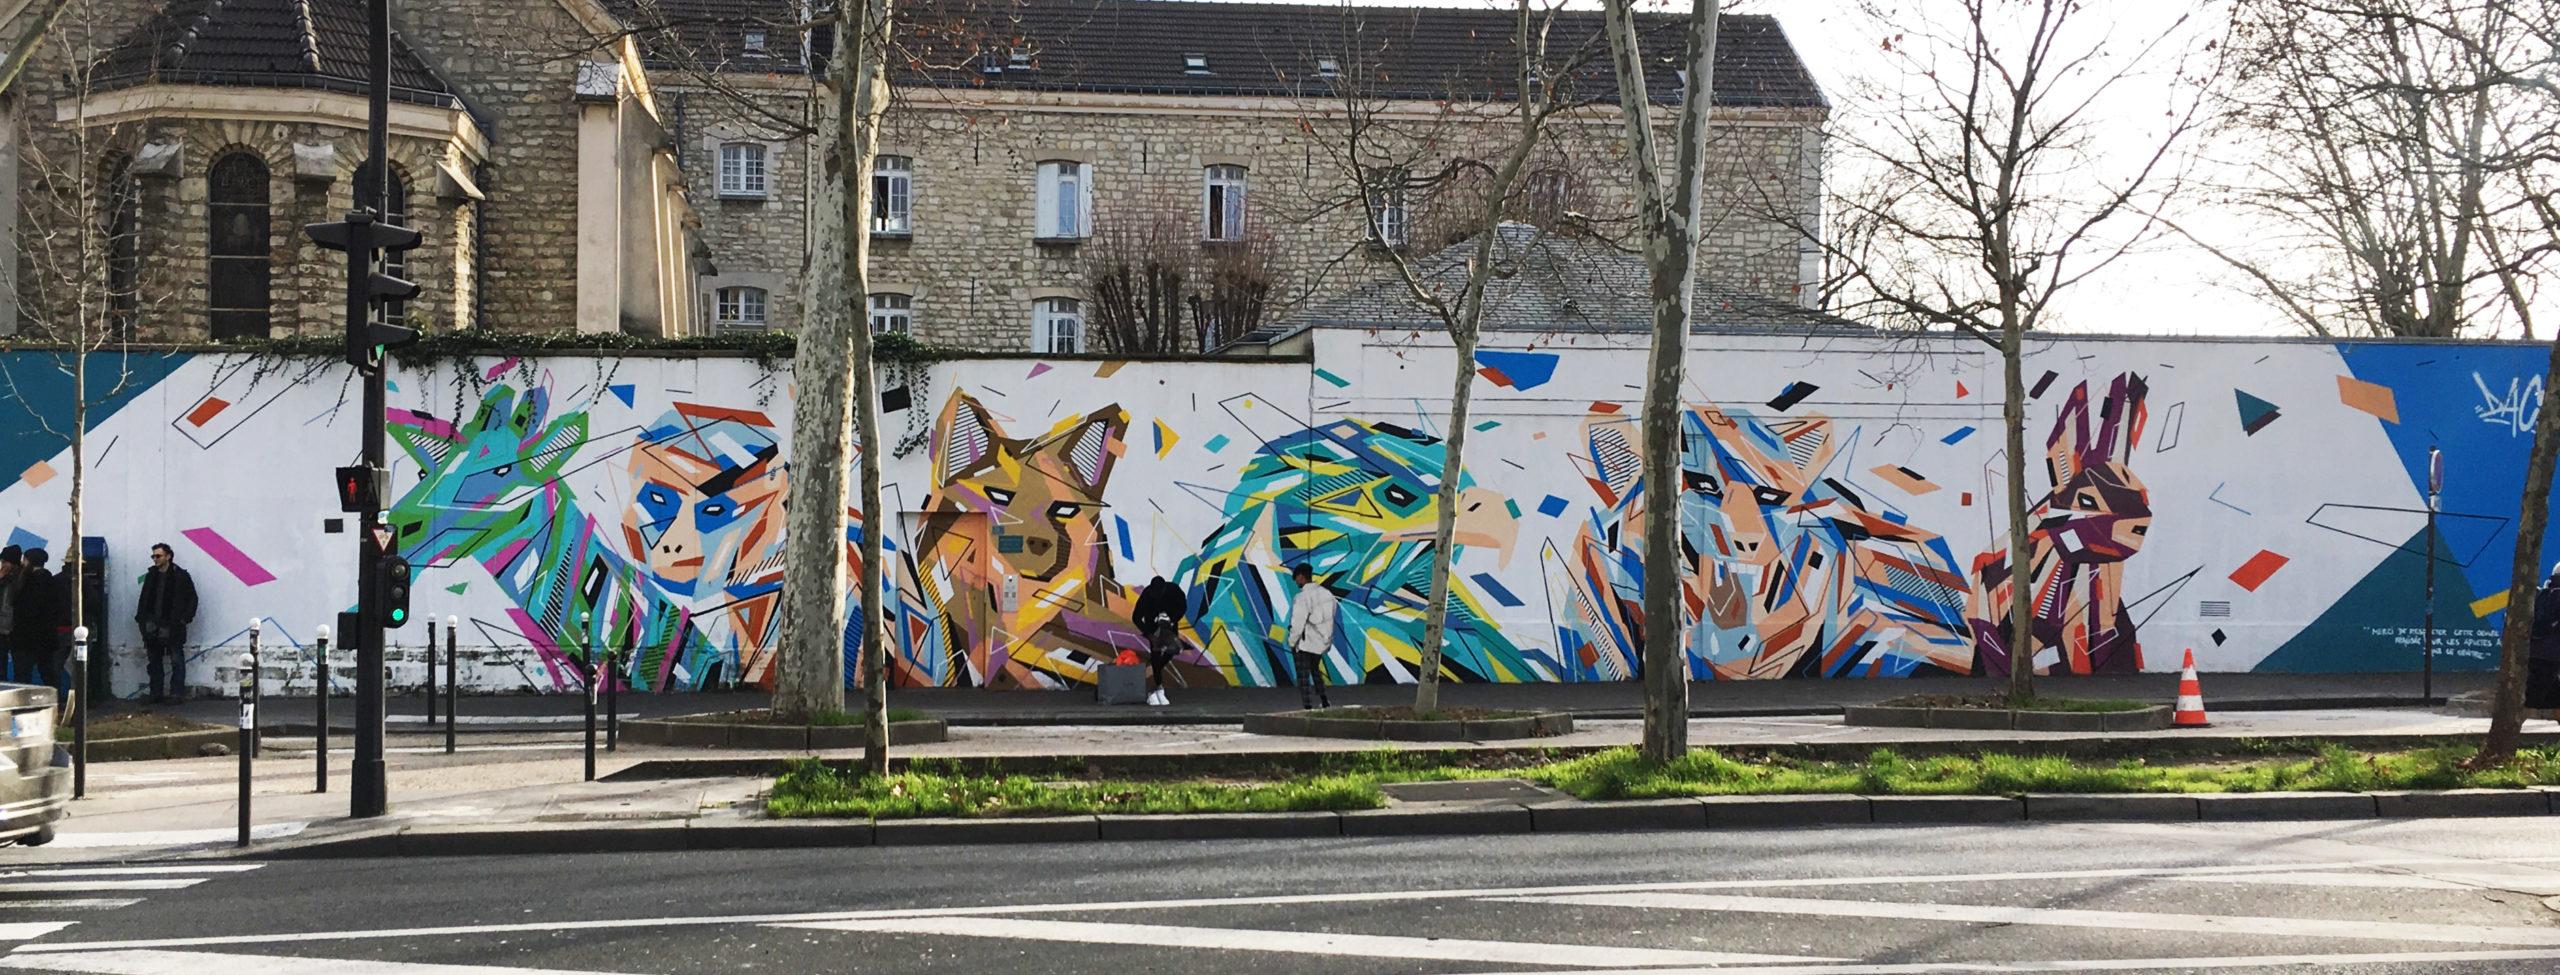 Fresque Graffaune Graffiti réalisée par Daco